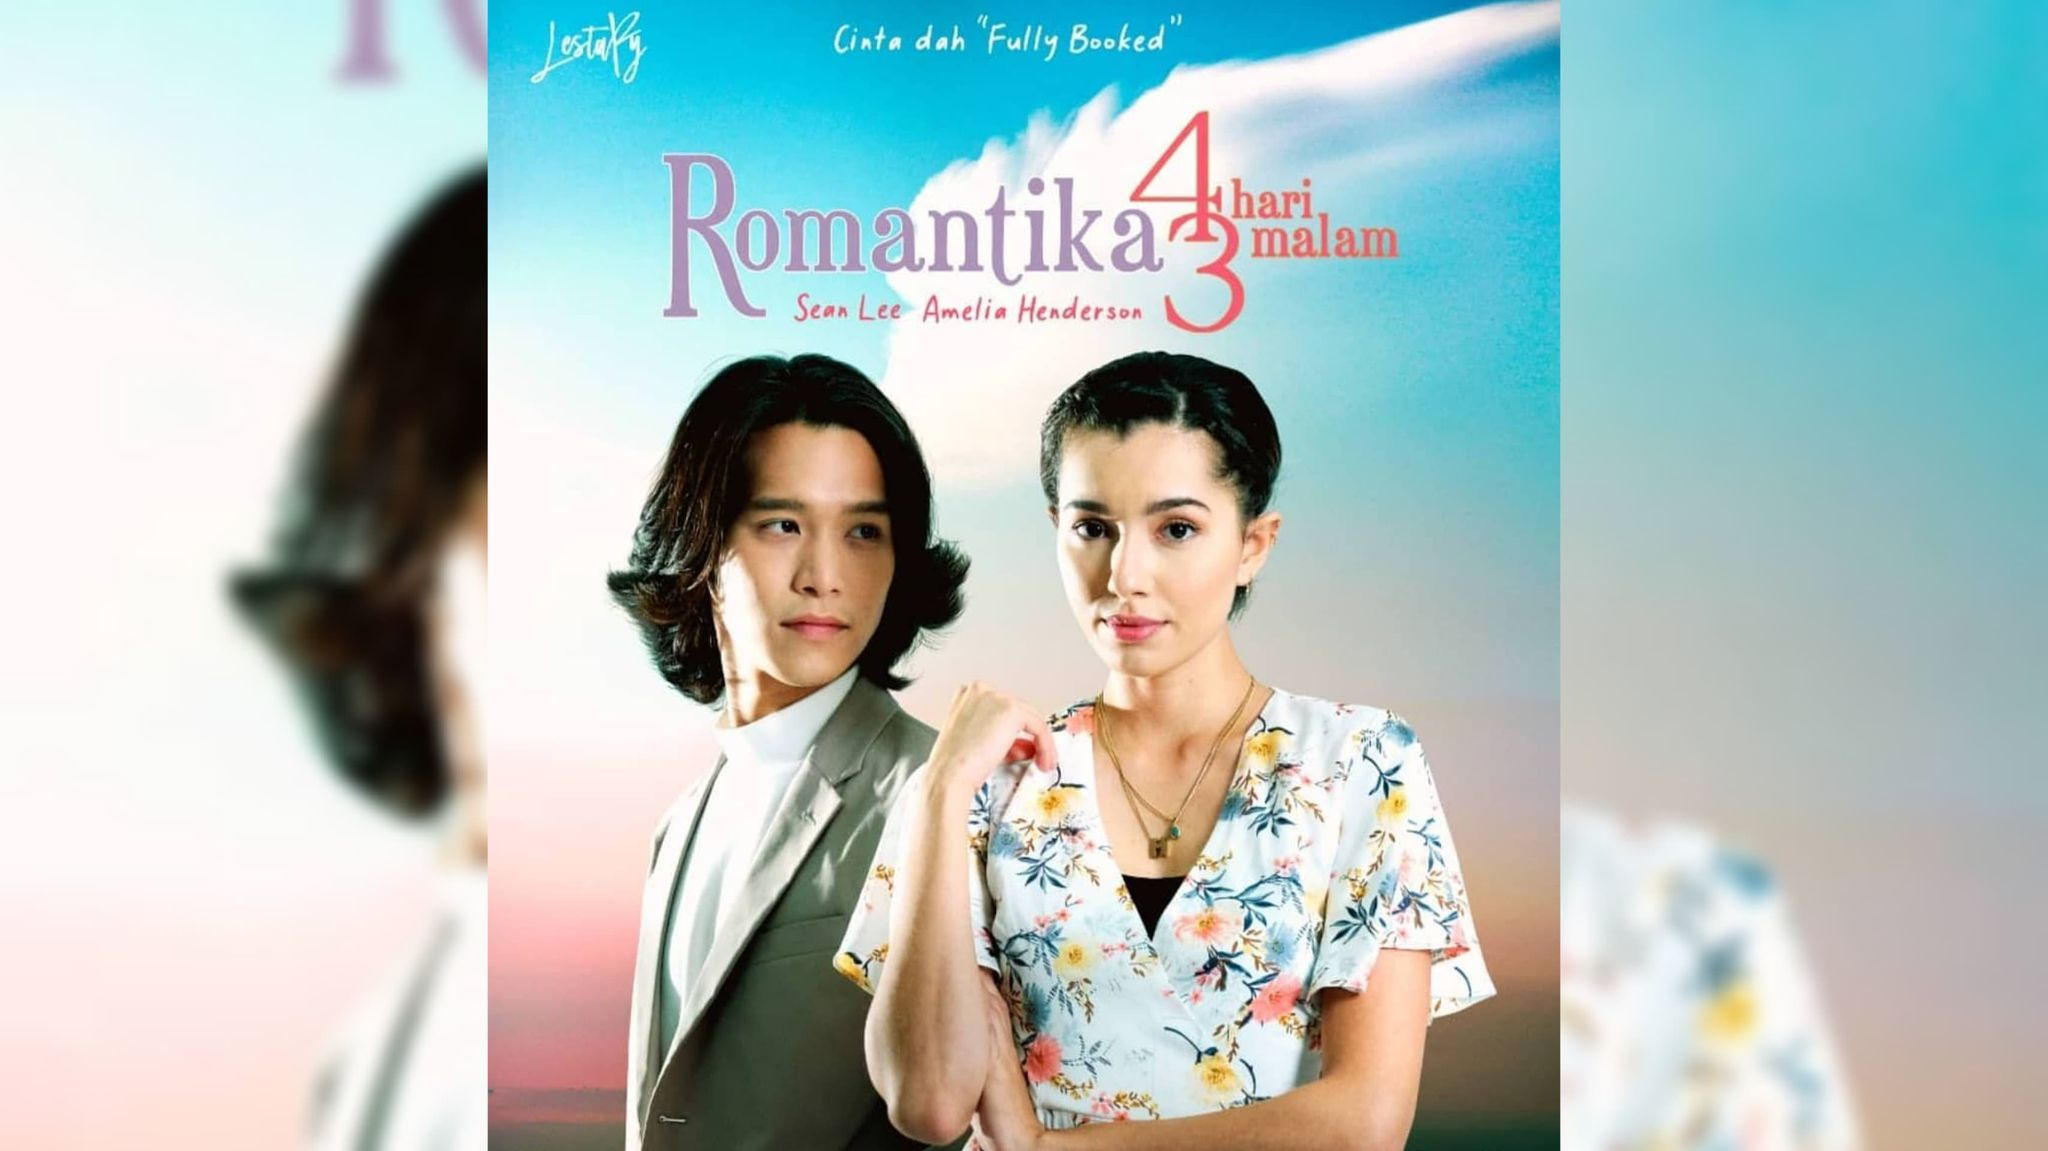 Drama Romantika 4 hari 3 malam